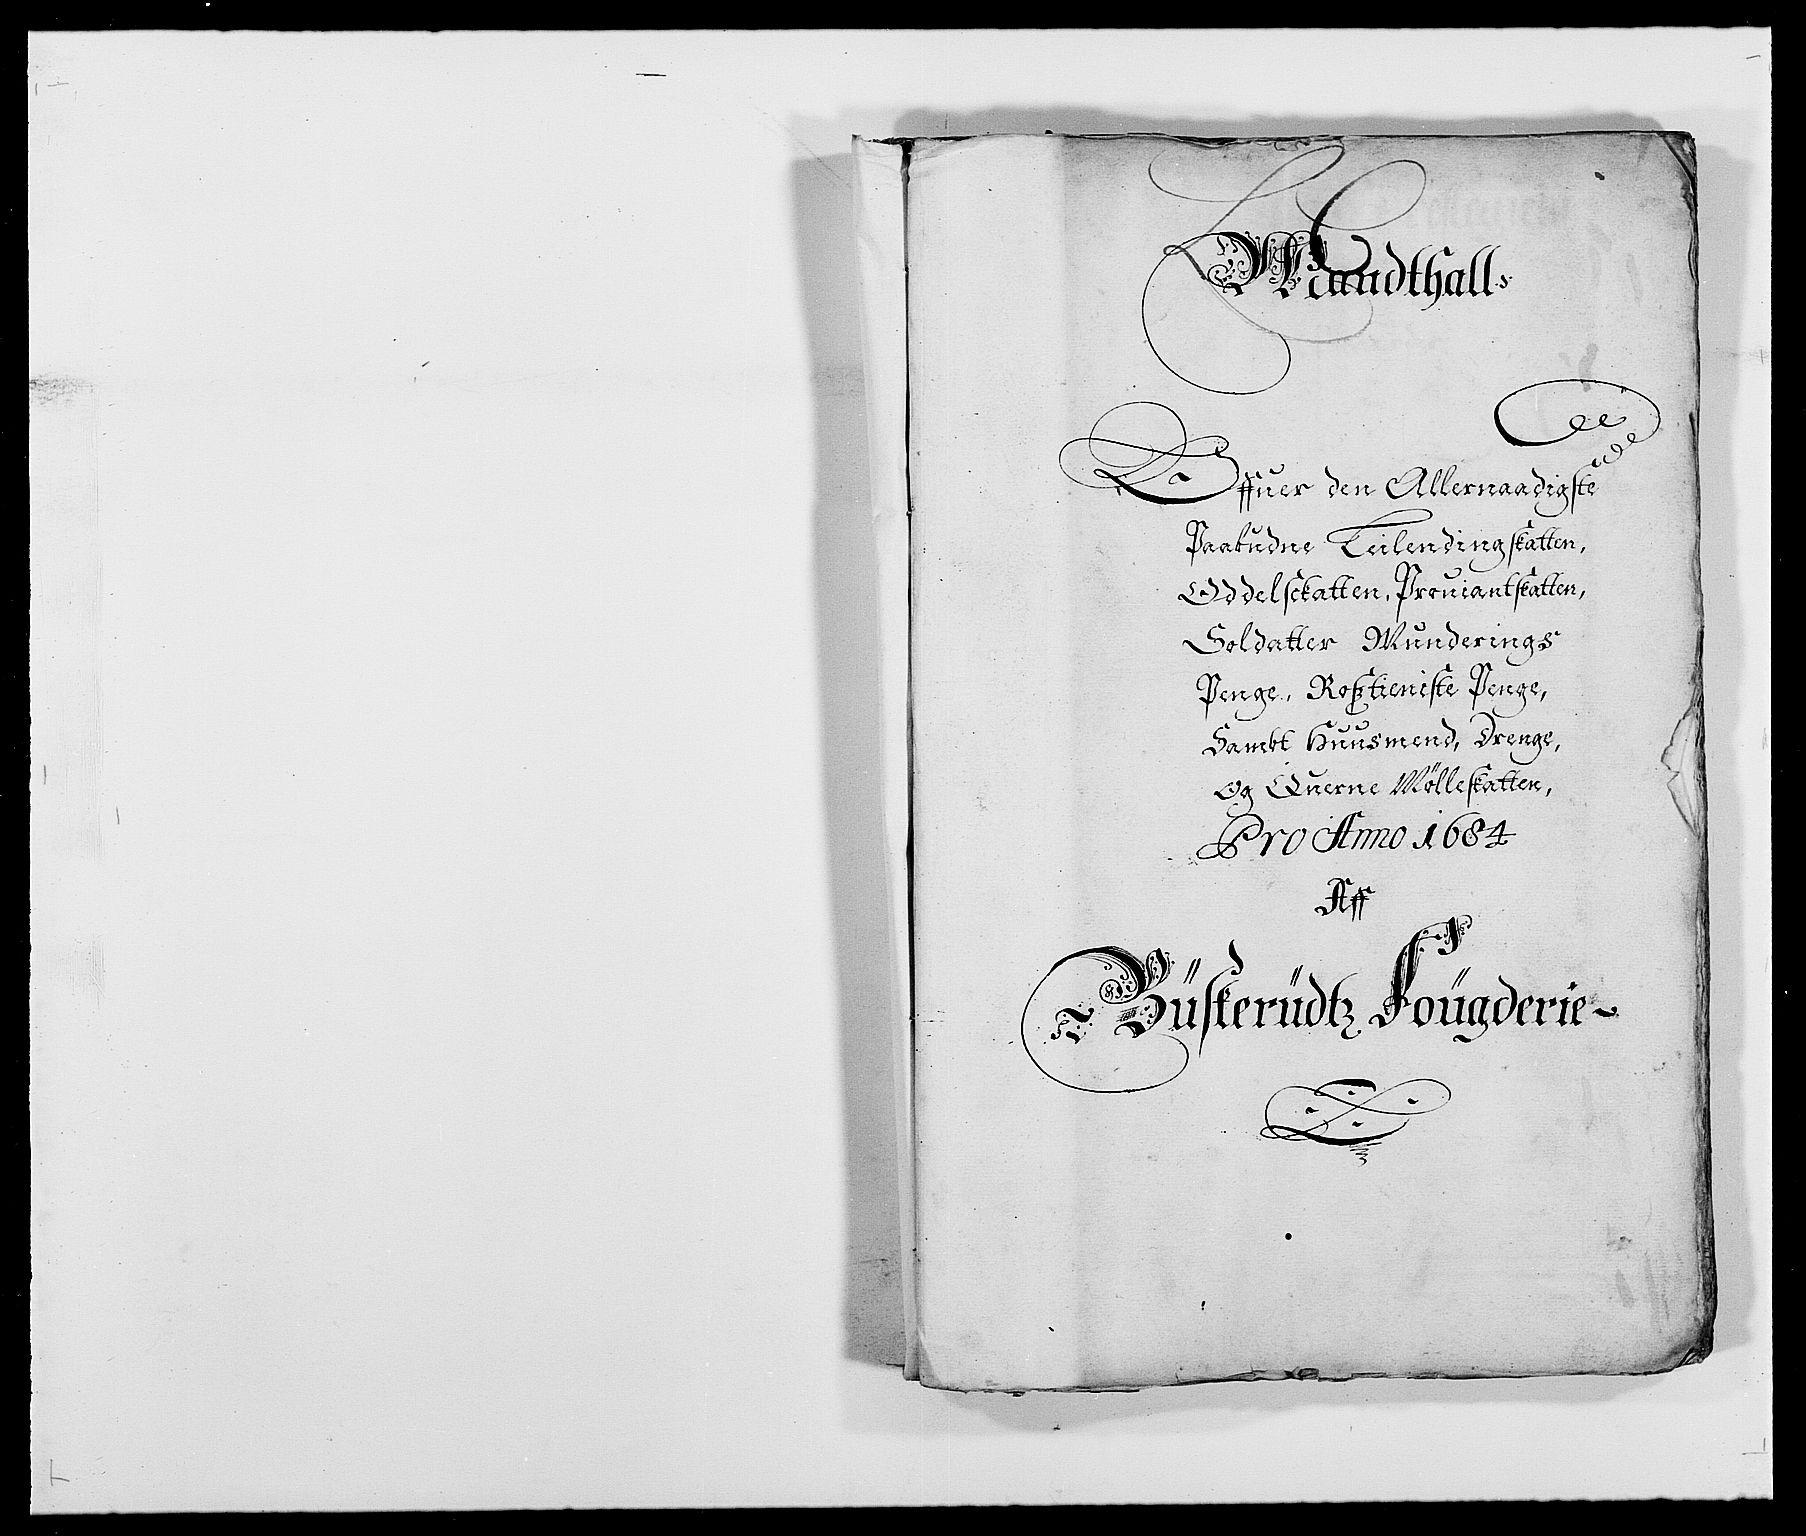 RA, Rentekammeret inntil 1814, Reviderte regnskaper, Fogderegnskap, R25/L1677: Fogderegnskap Buskerud, 1683-1684, s. 209